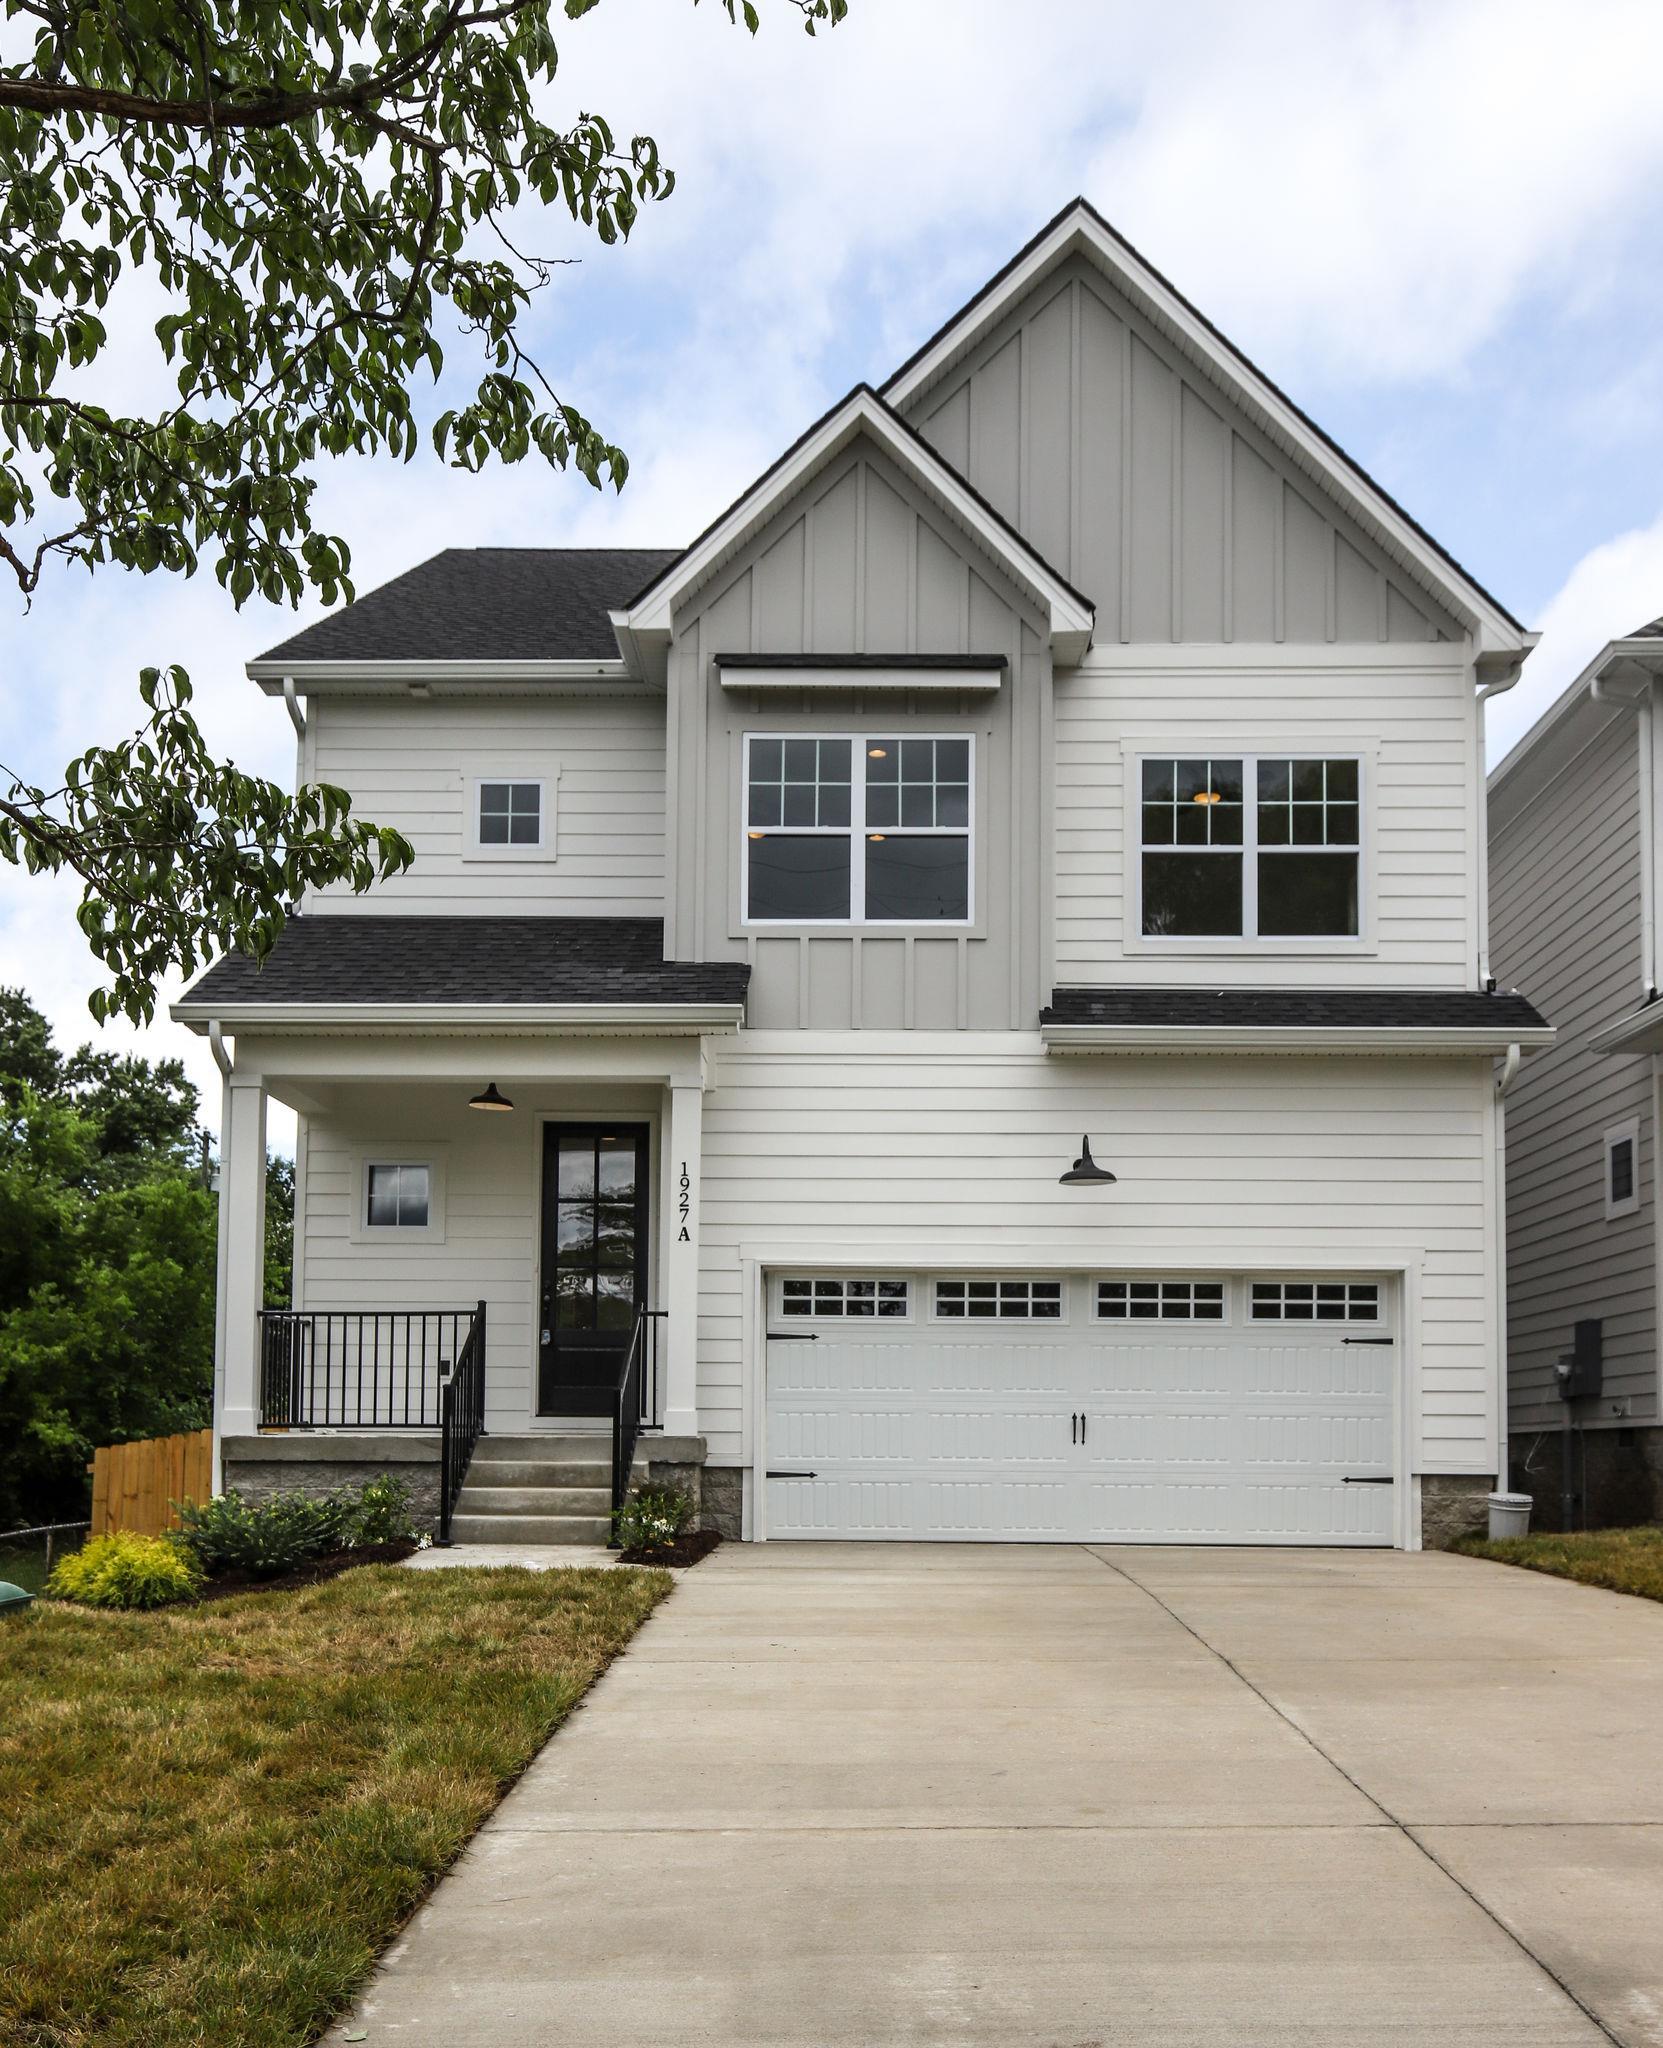 1927A Berkshire Dr, Nashville, TN 37216 - Nashville, TN real estate listing